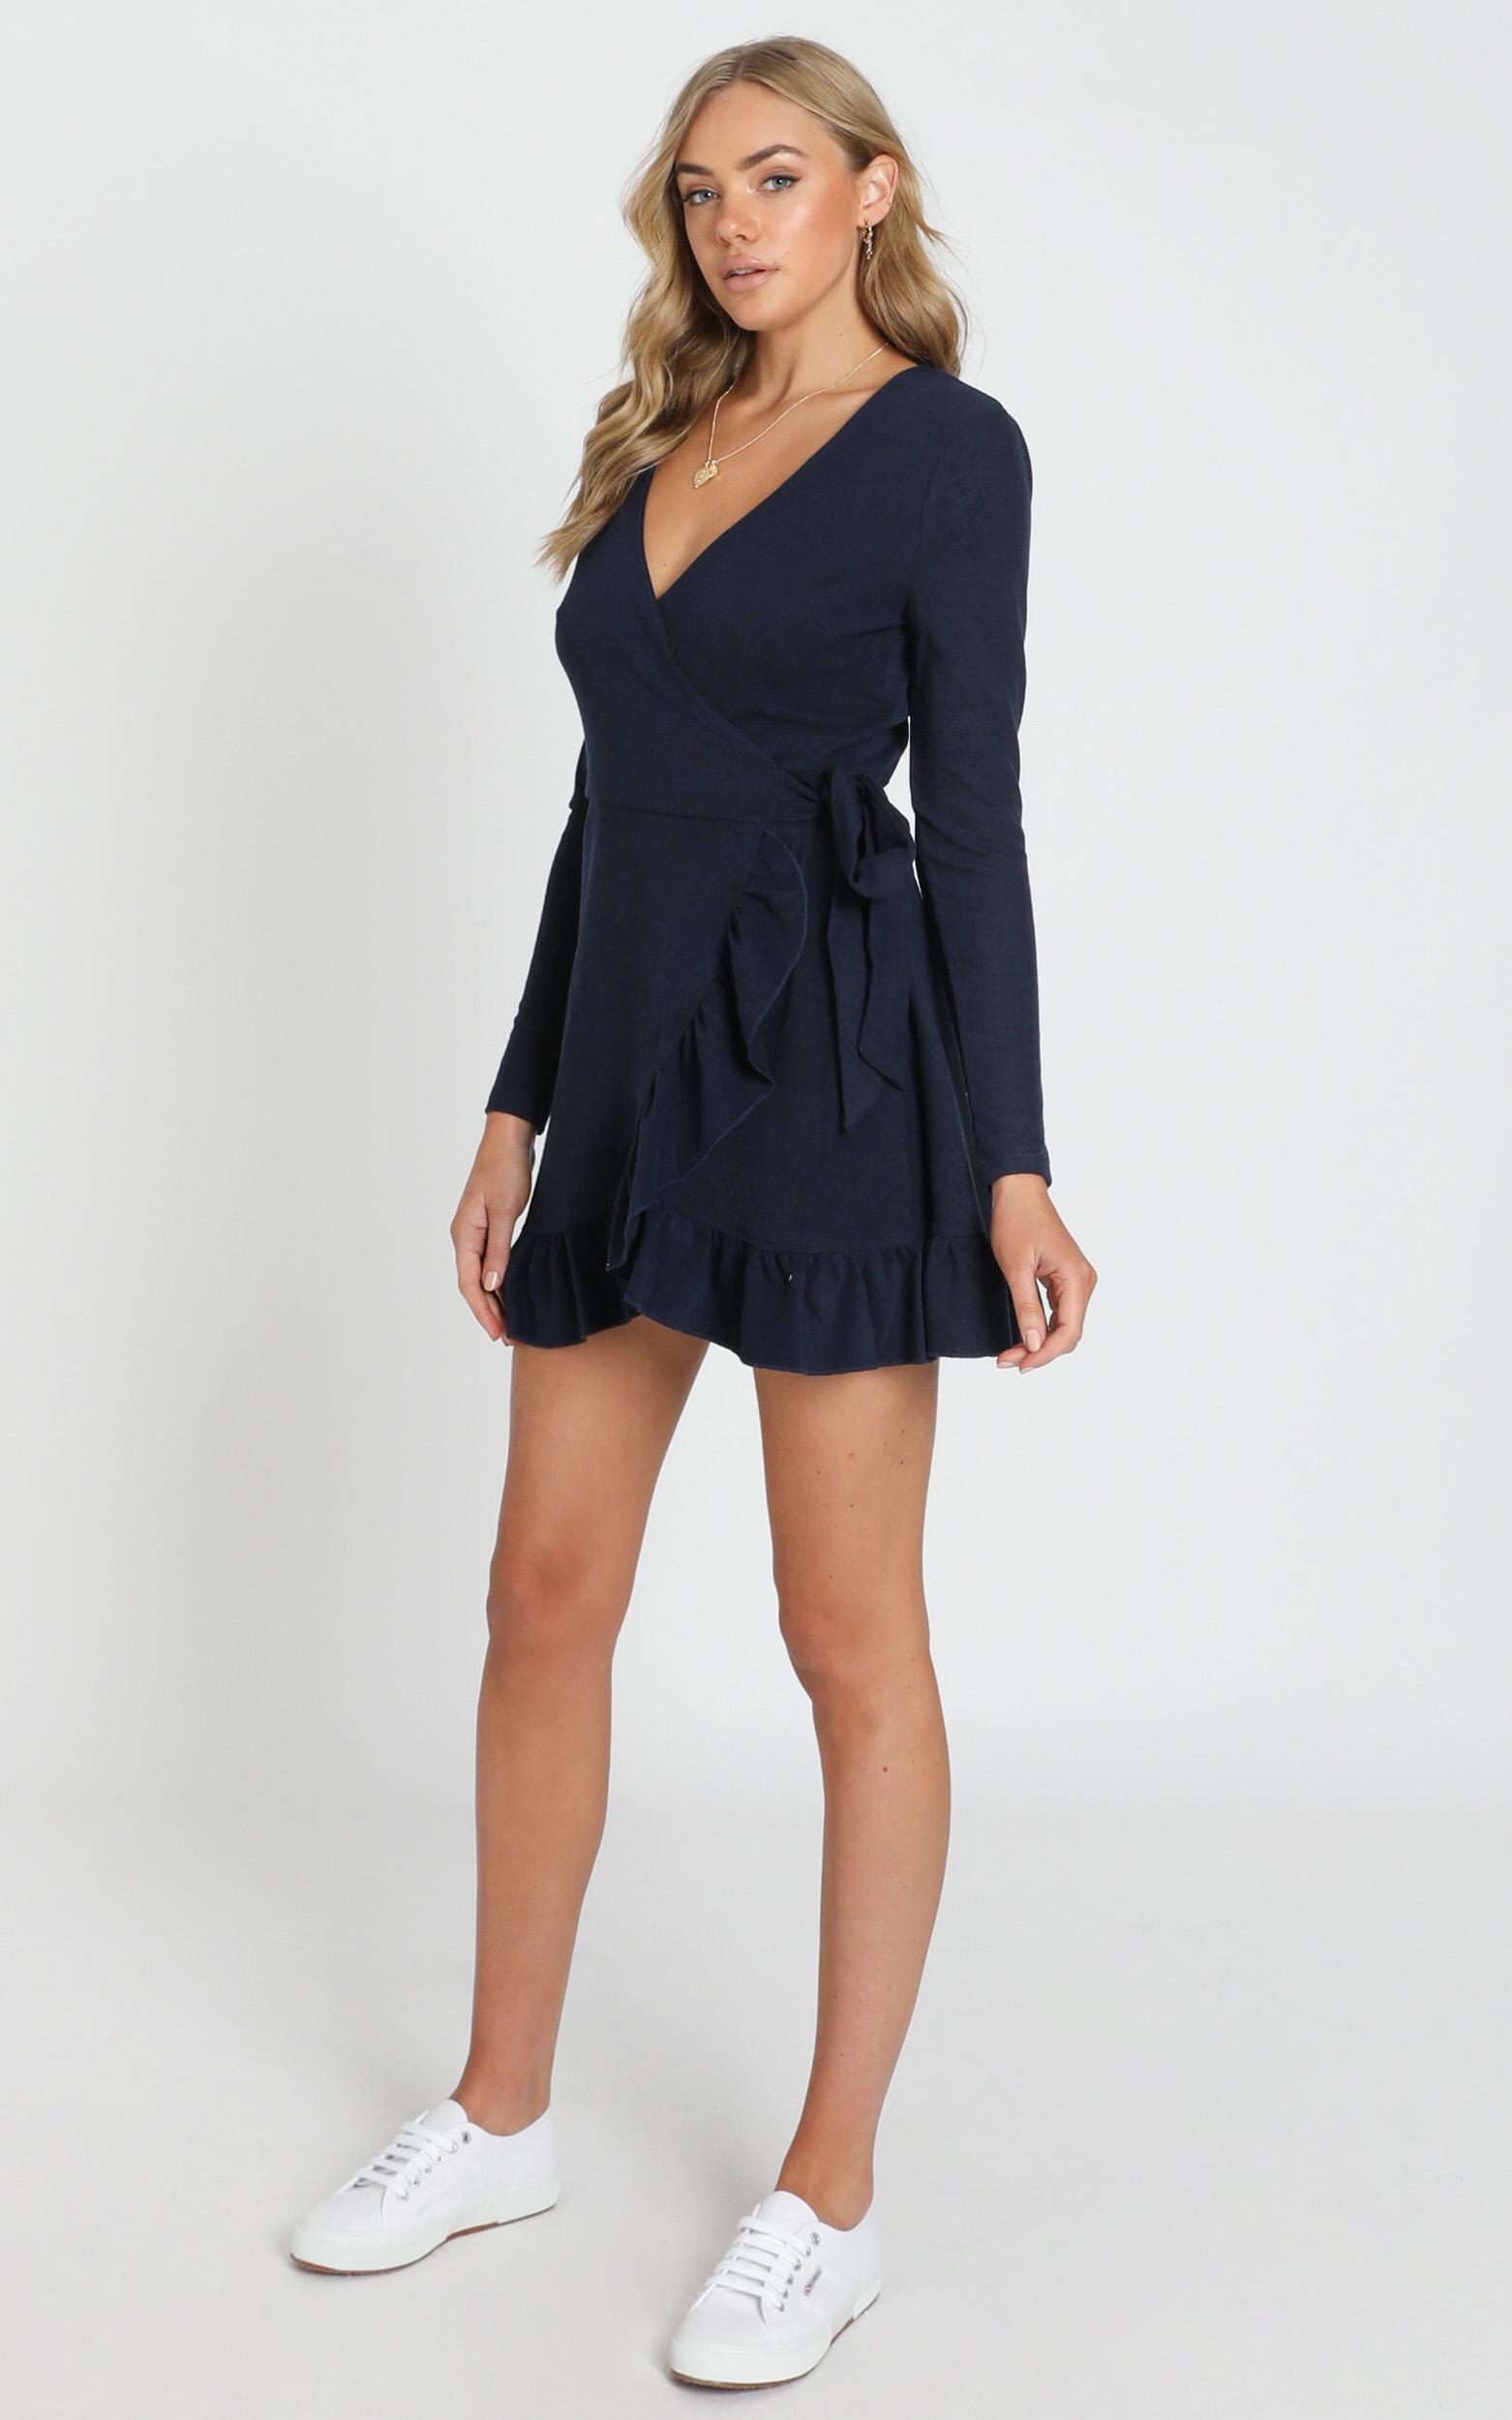 Eyes Talk Dress in navy - 20 (XXXXL), Navy, hi-res image number null